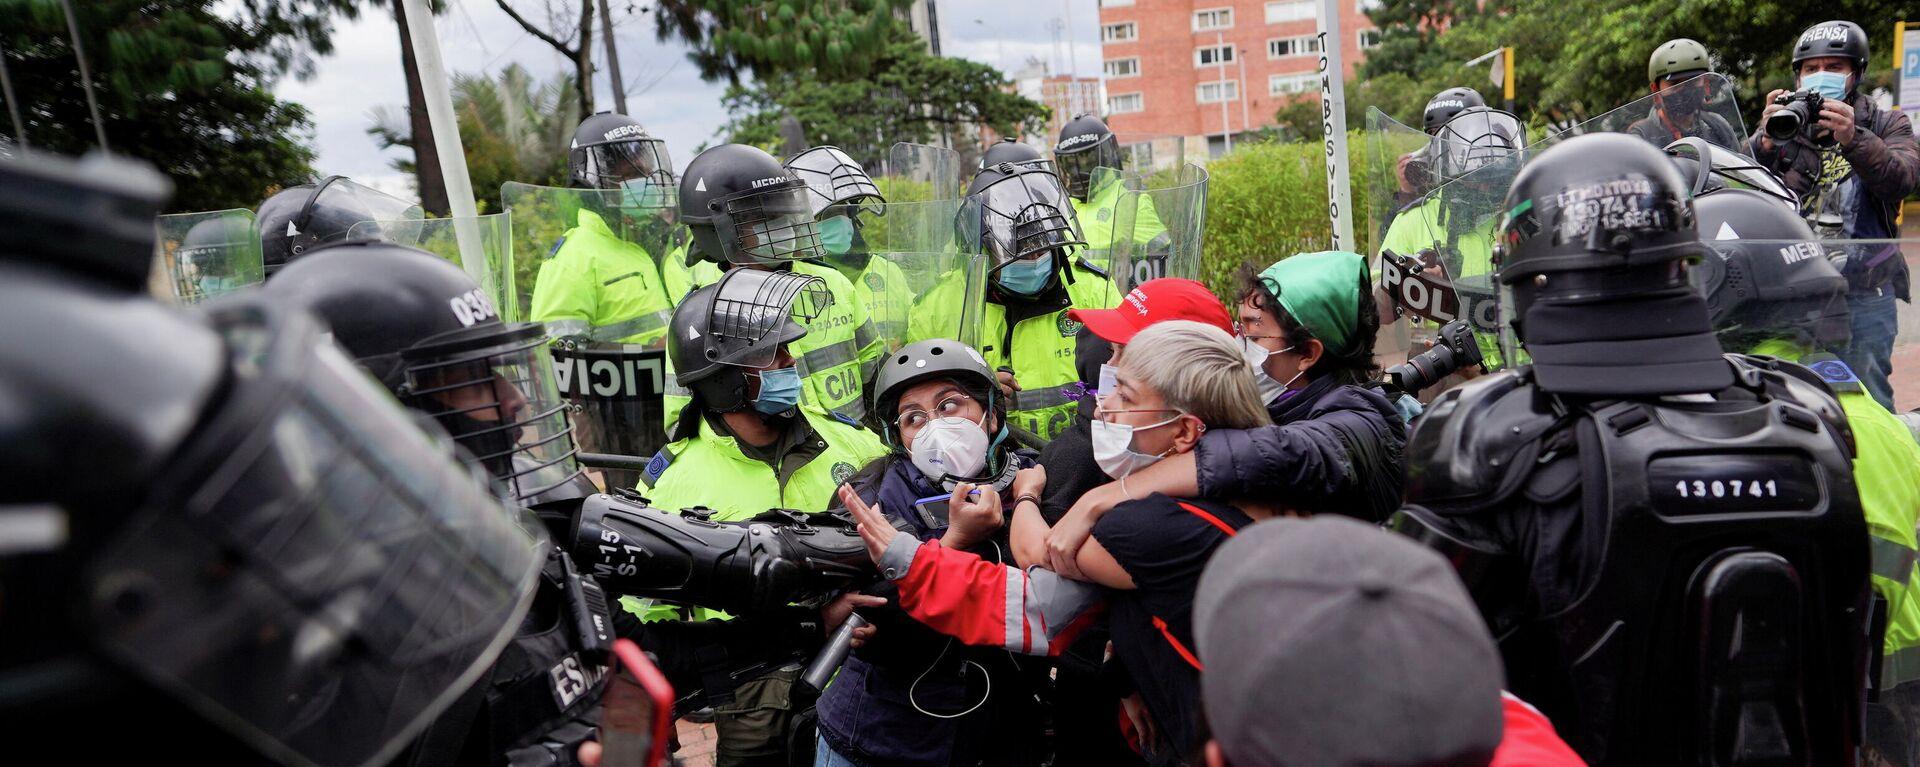 Protestas en Colombia - Sputnik Mundo, 1920, 25.05.2021